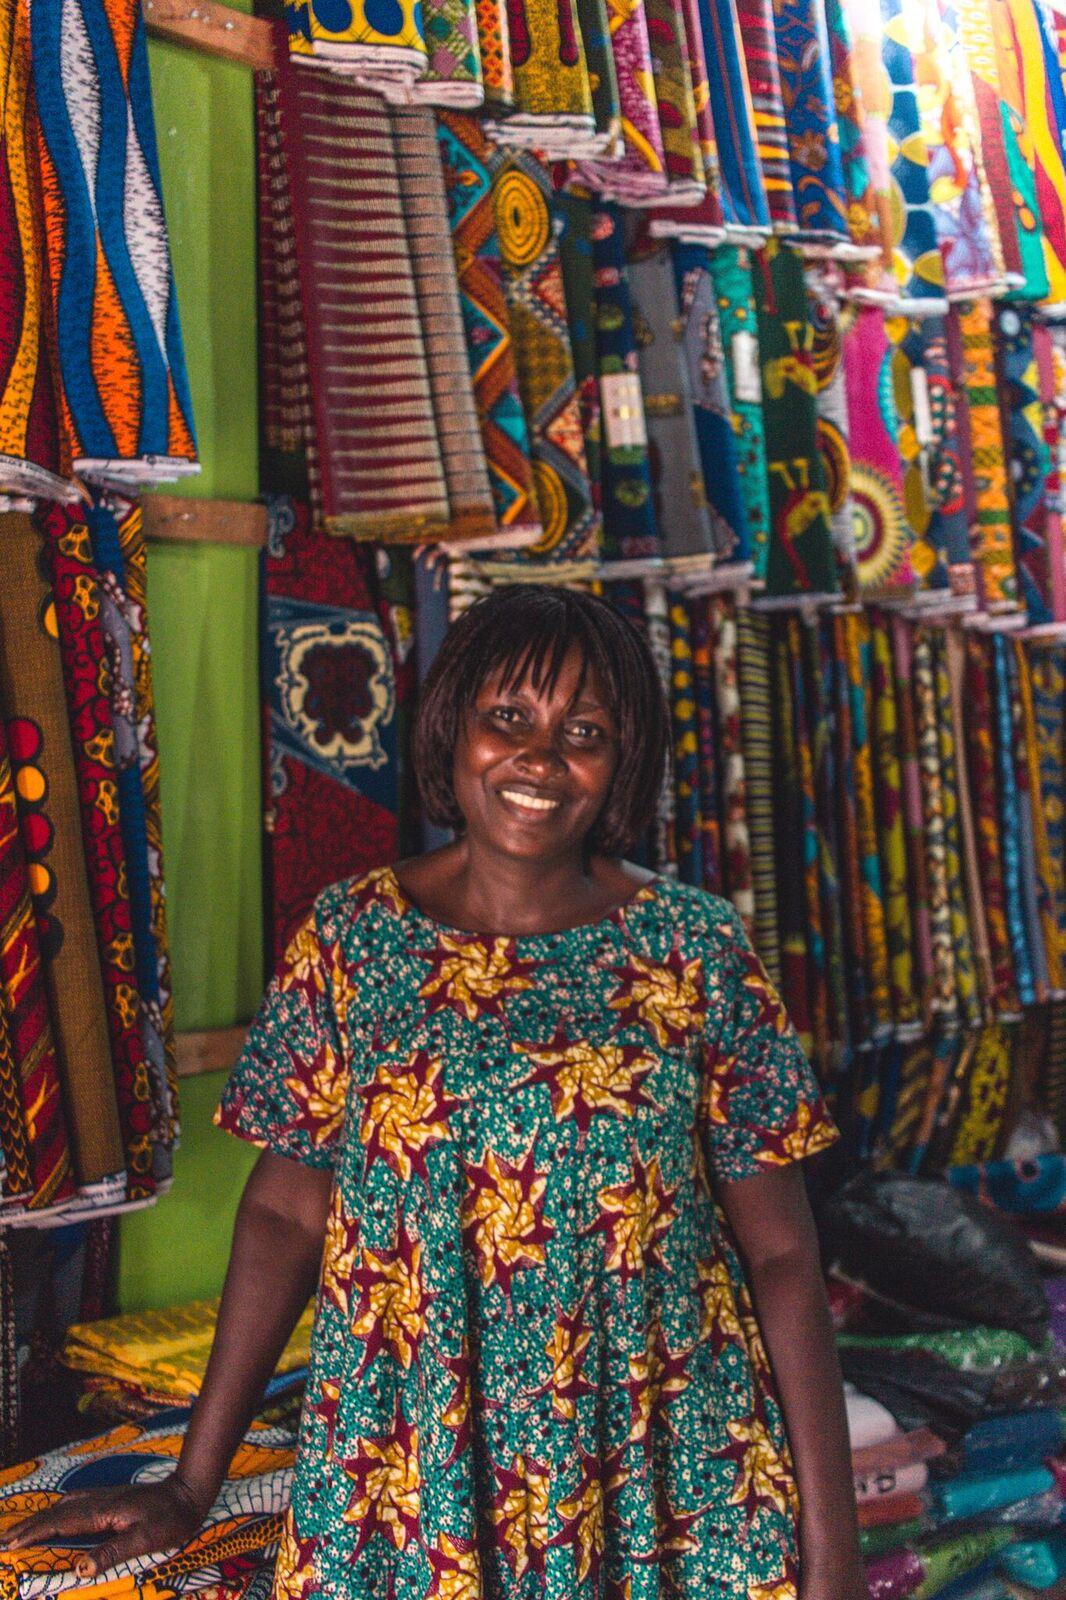 Woman with fabrics.jpeg